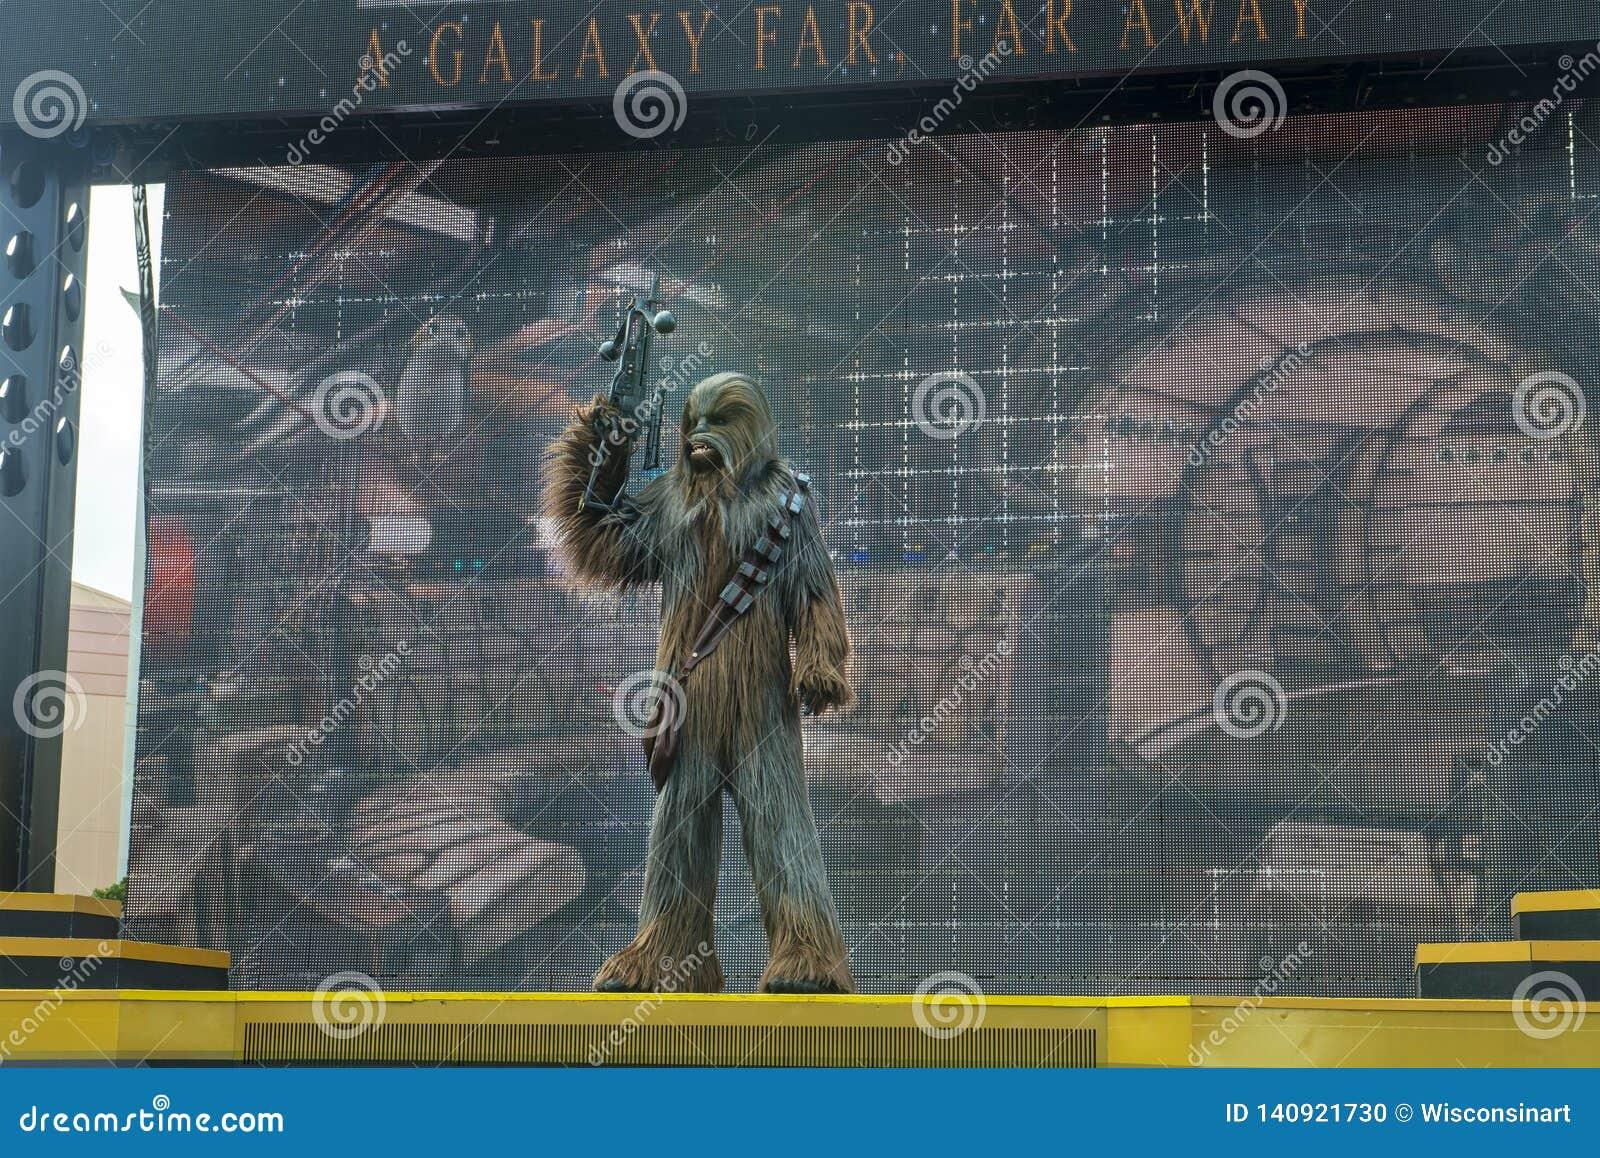 Chewbacca, Star Wars, Disney World, Reis